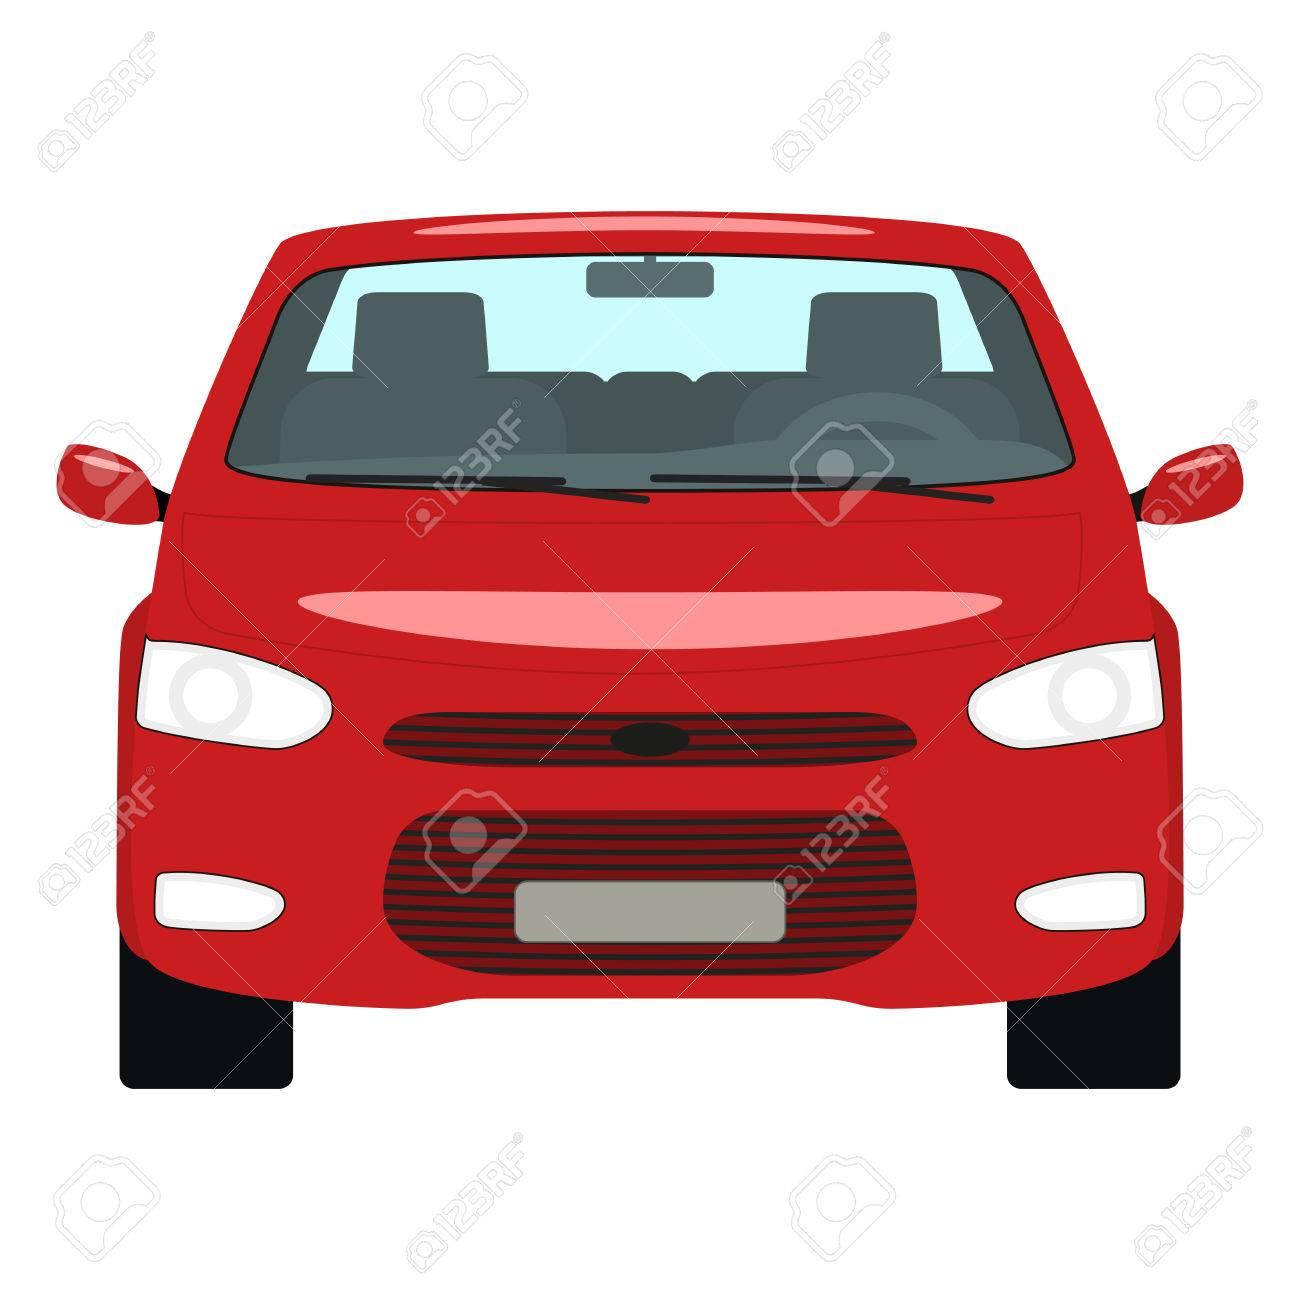 Vector Cartoon Red Car Front View Royalty Free Cliparts, Vectors ...